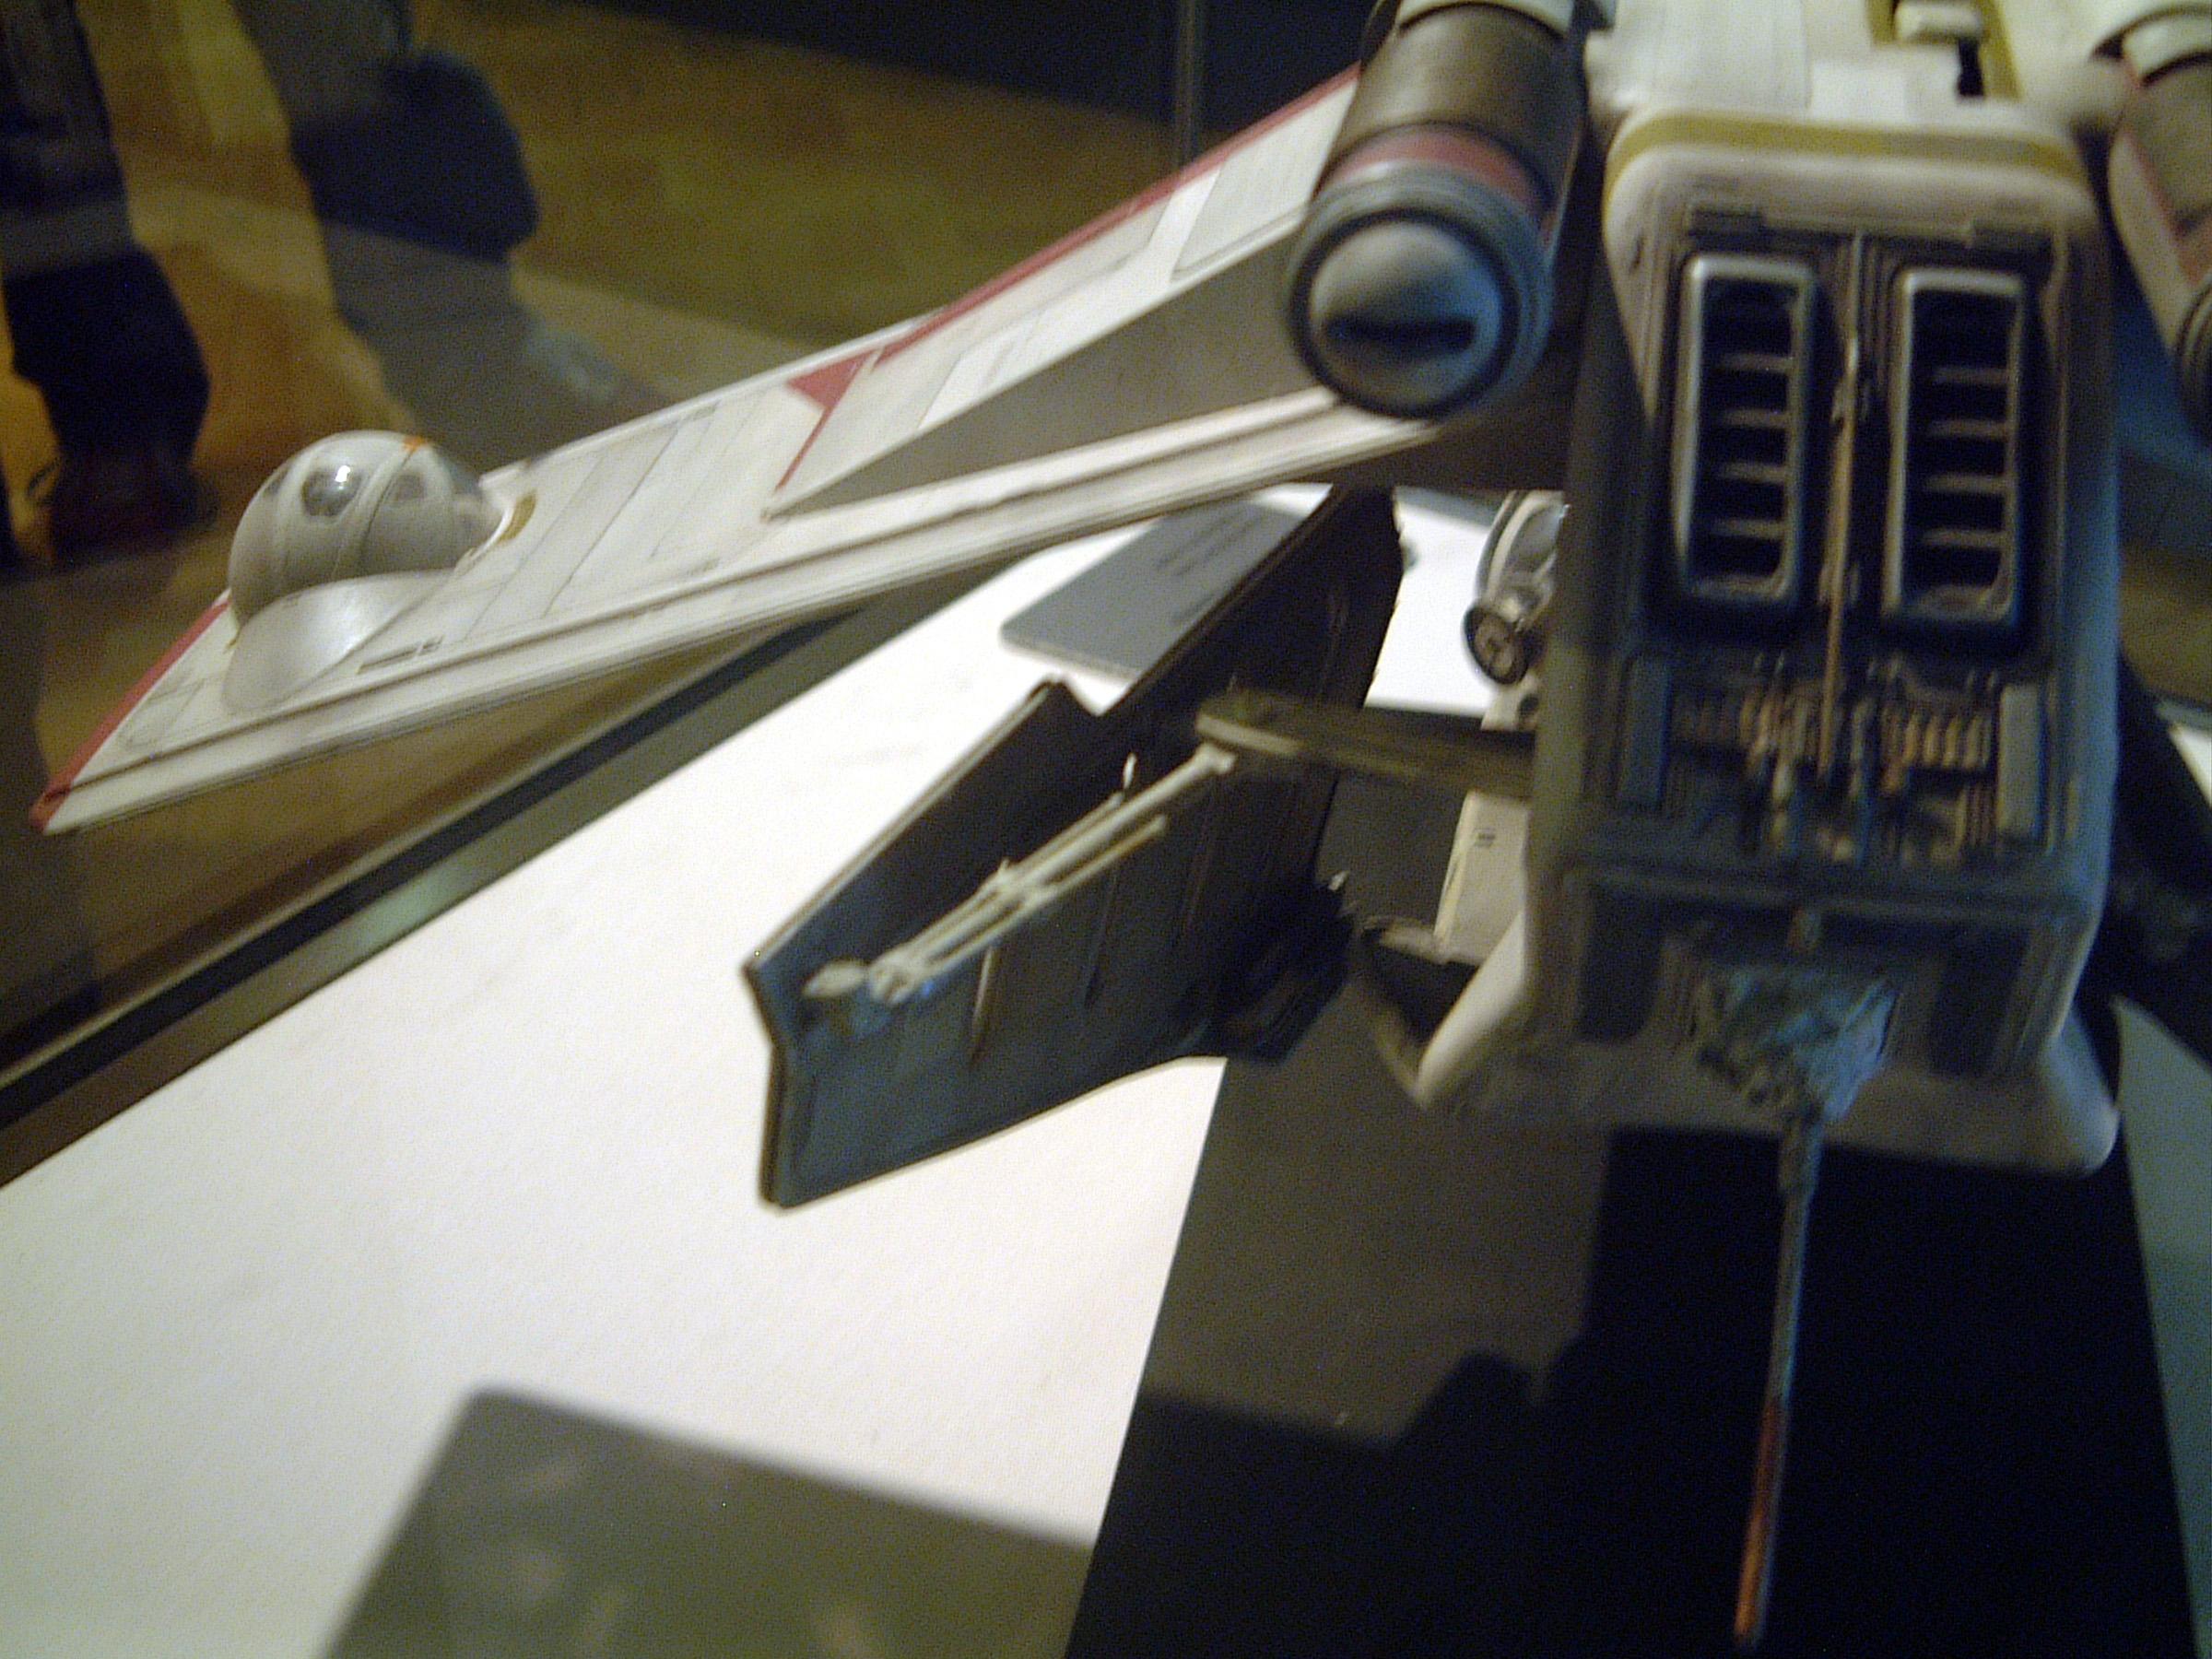 kg_republic_gunship-013.jpg